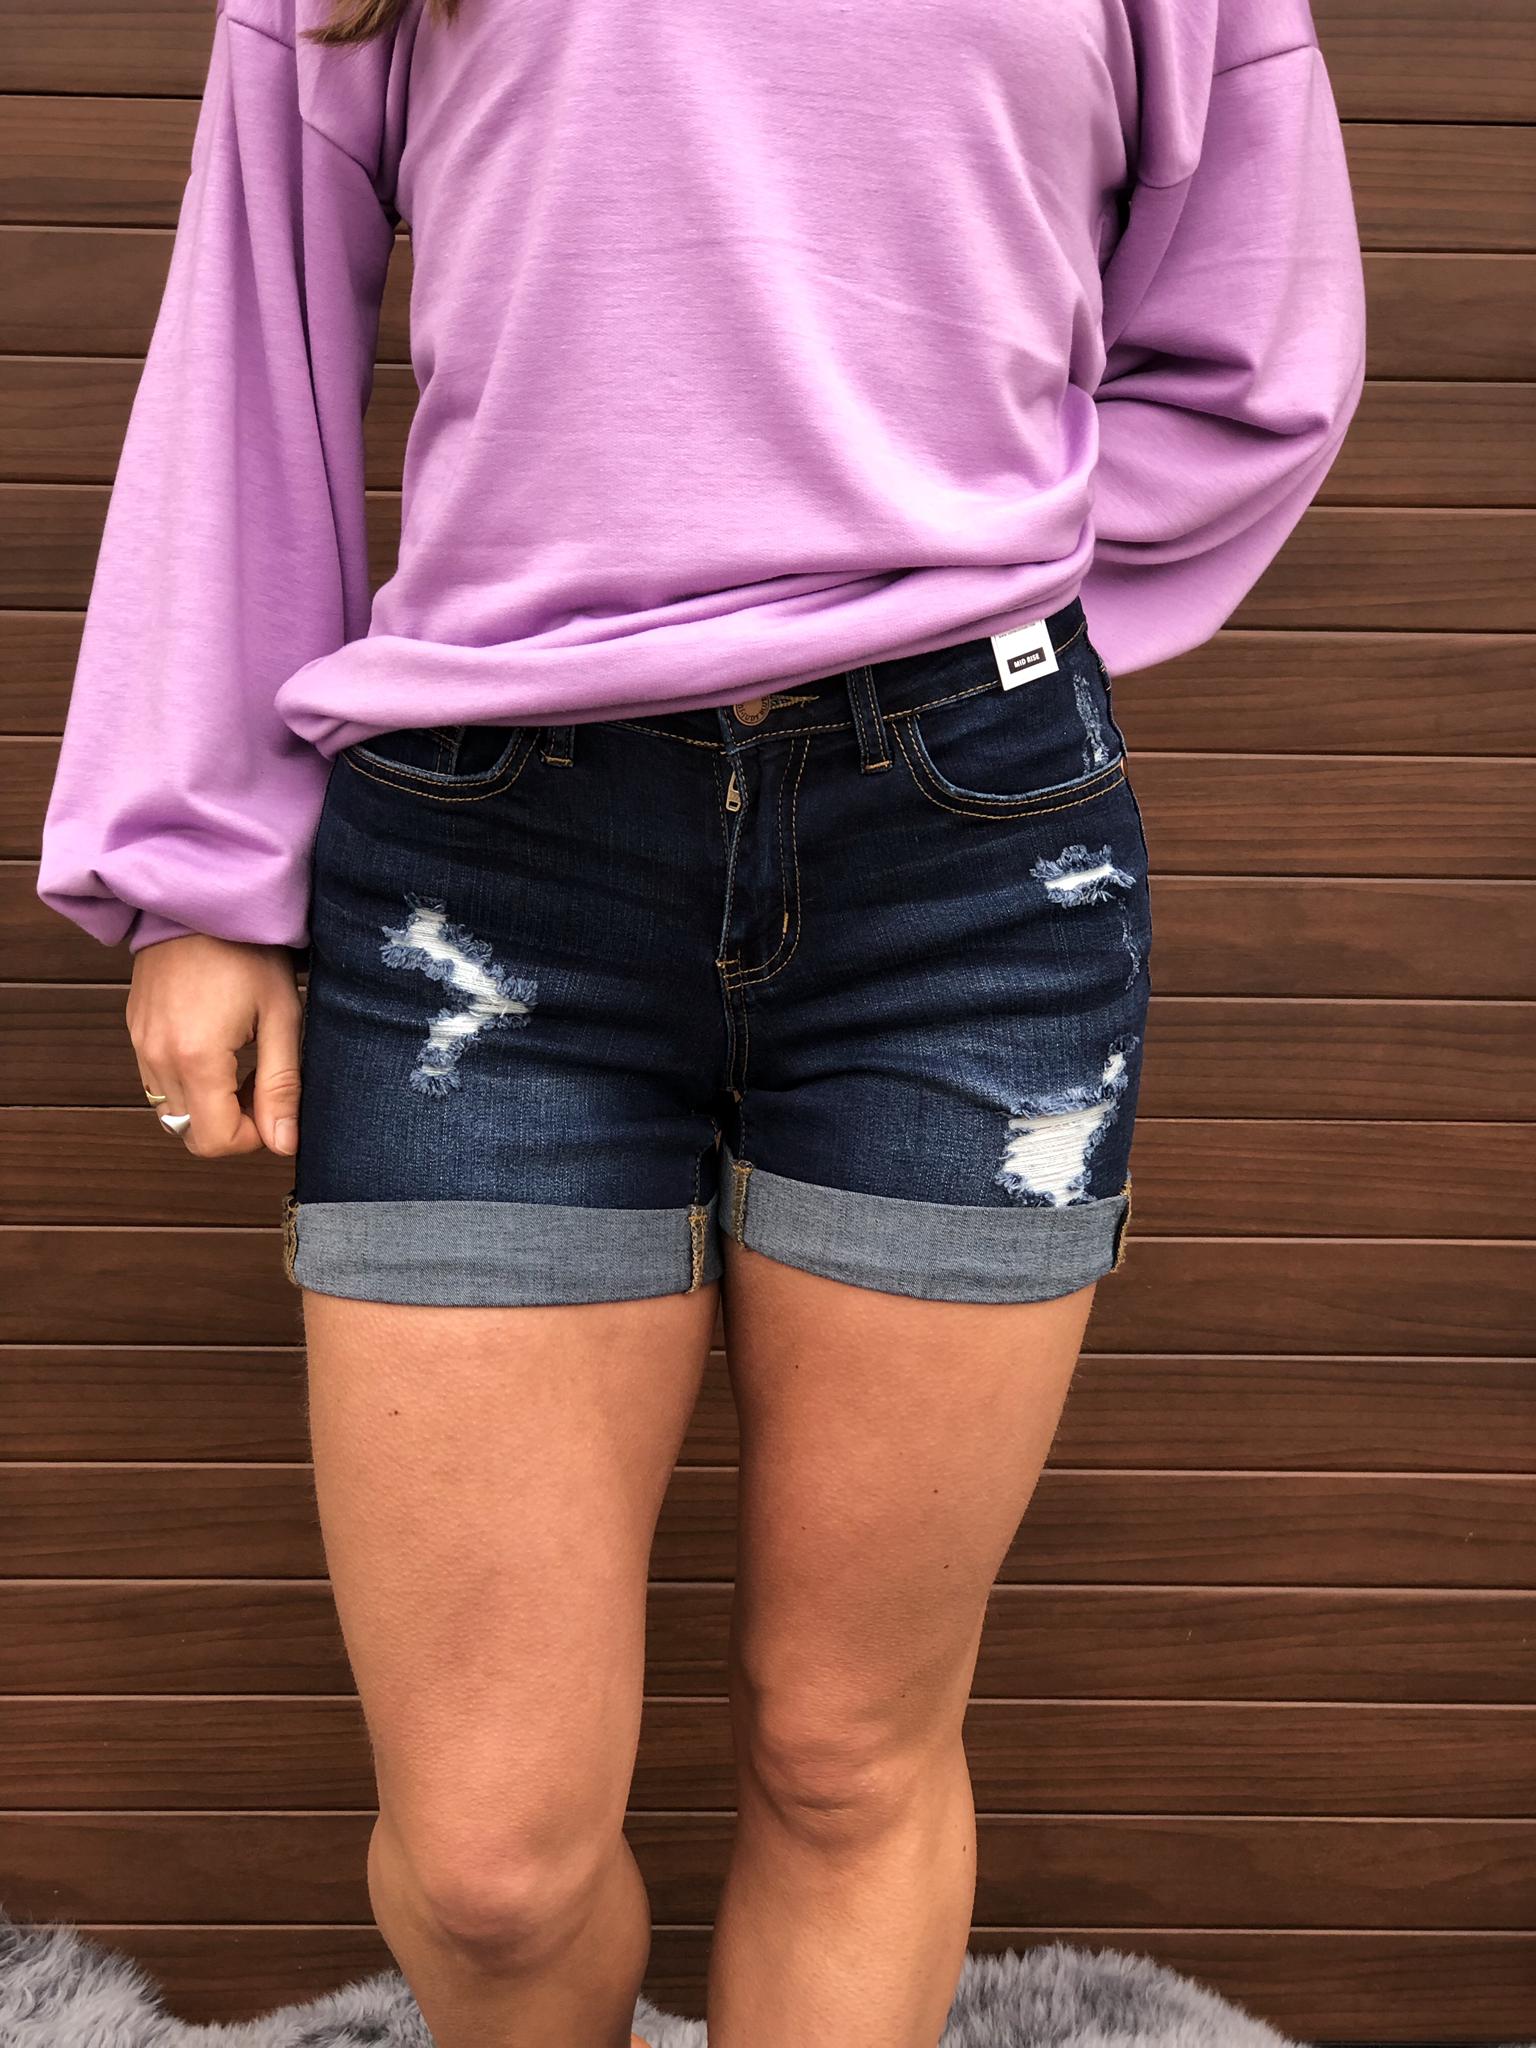 Judy Blue Denim shorts dark wash 99999982039